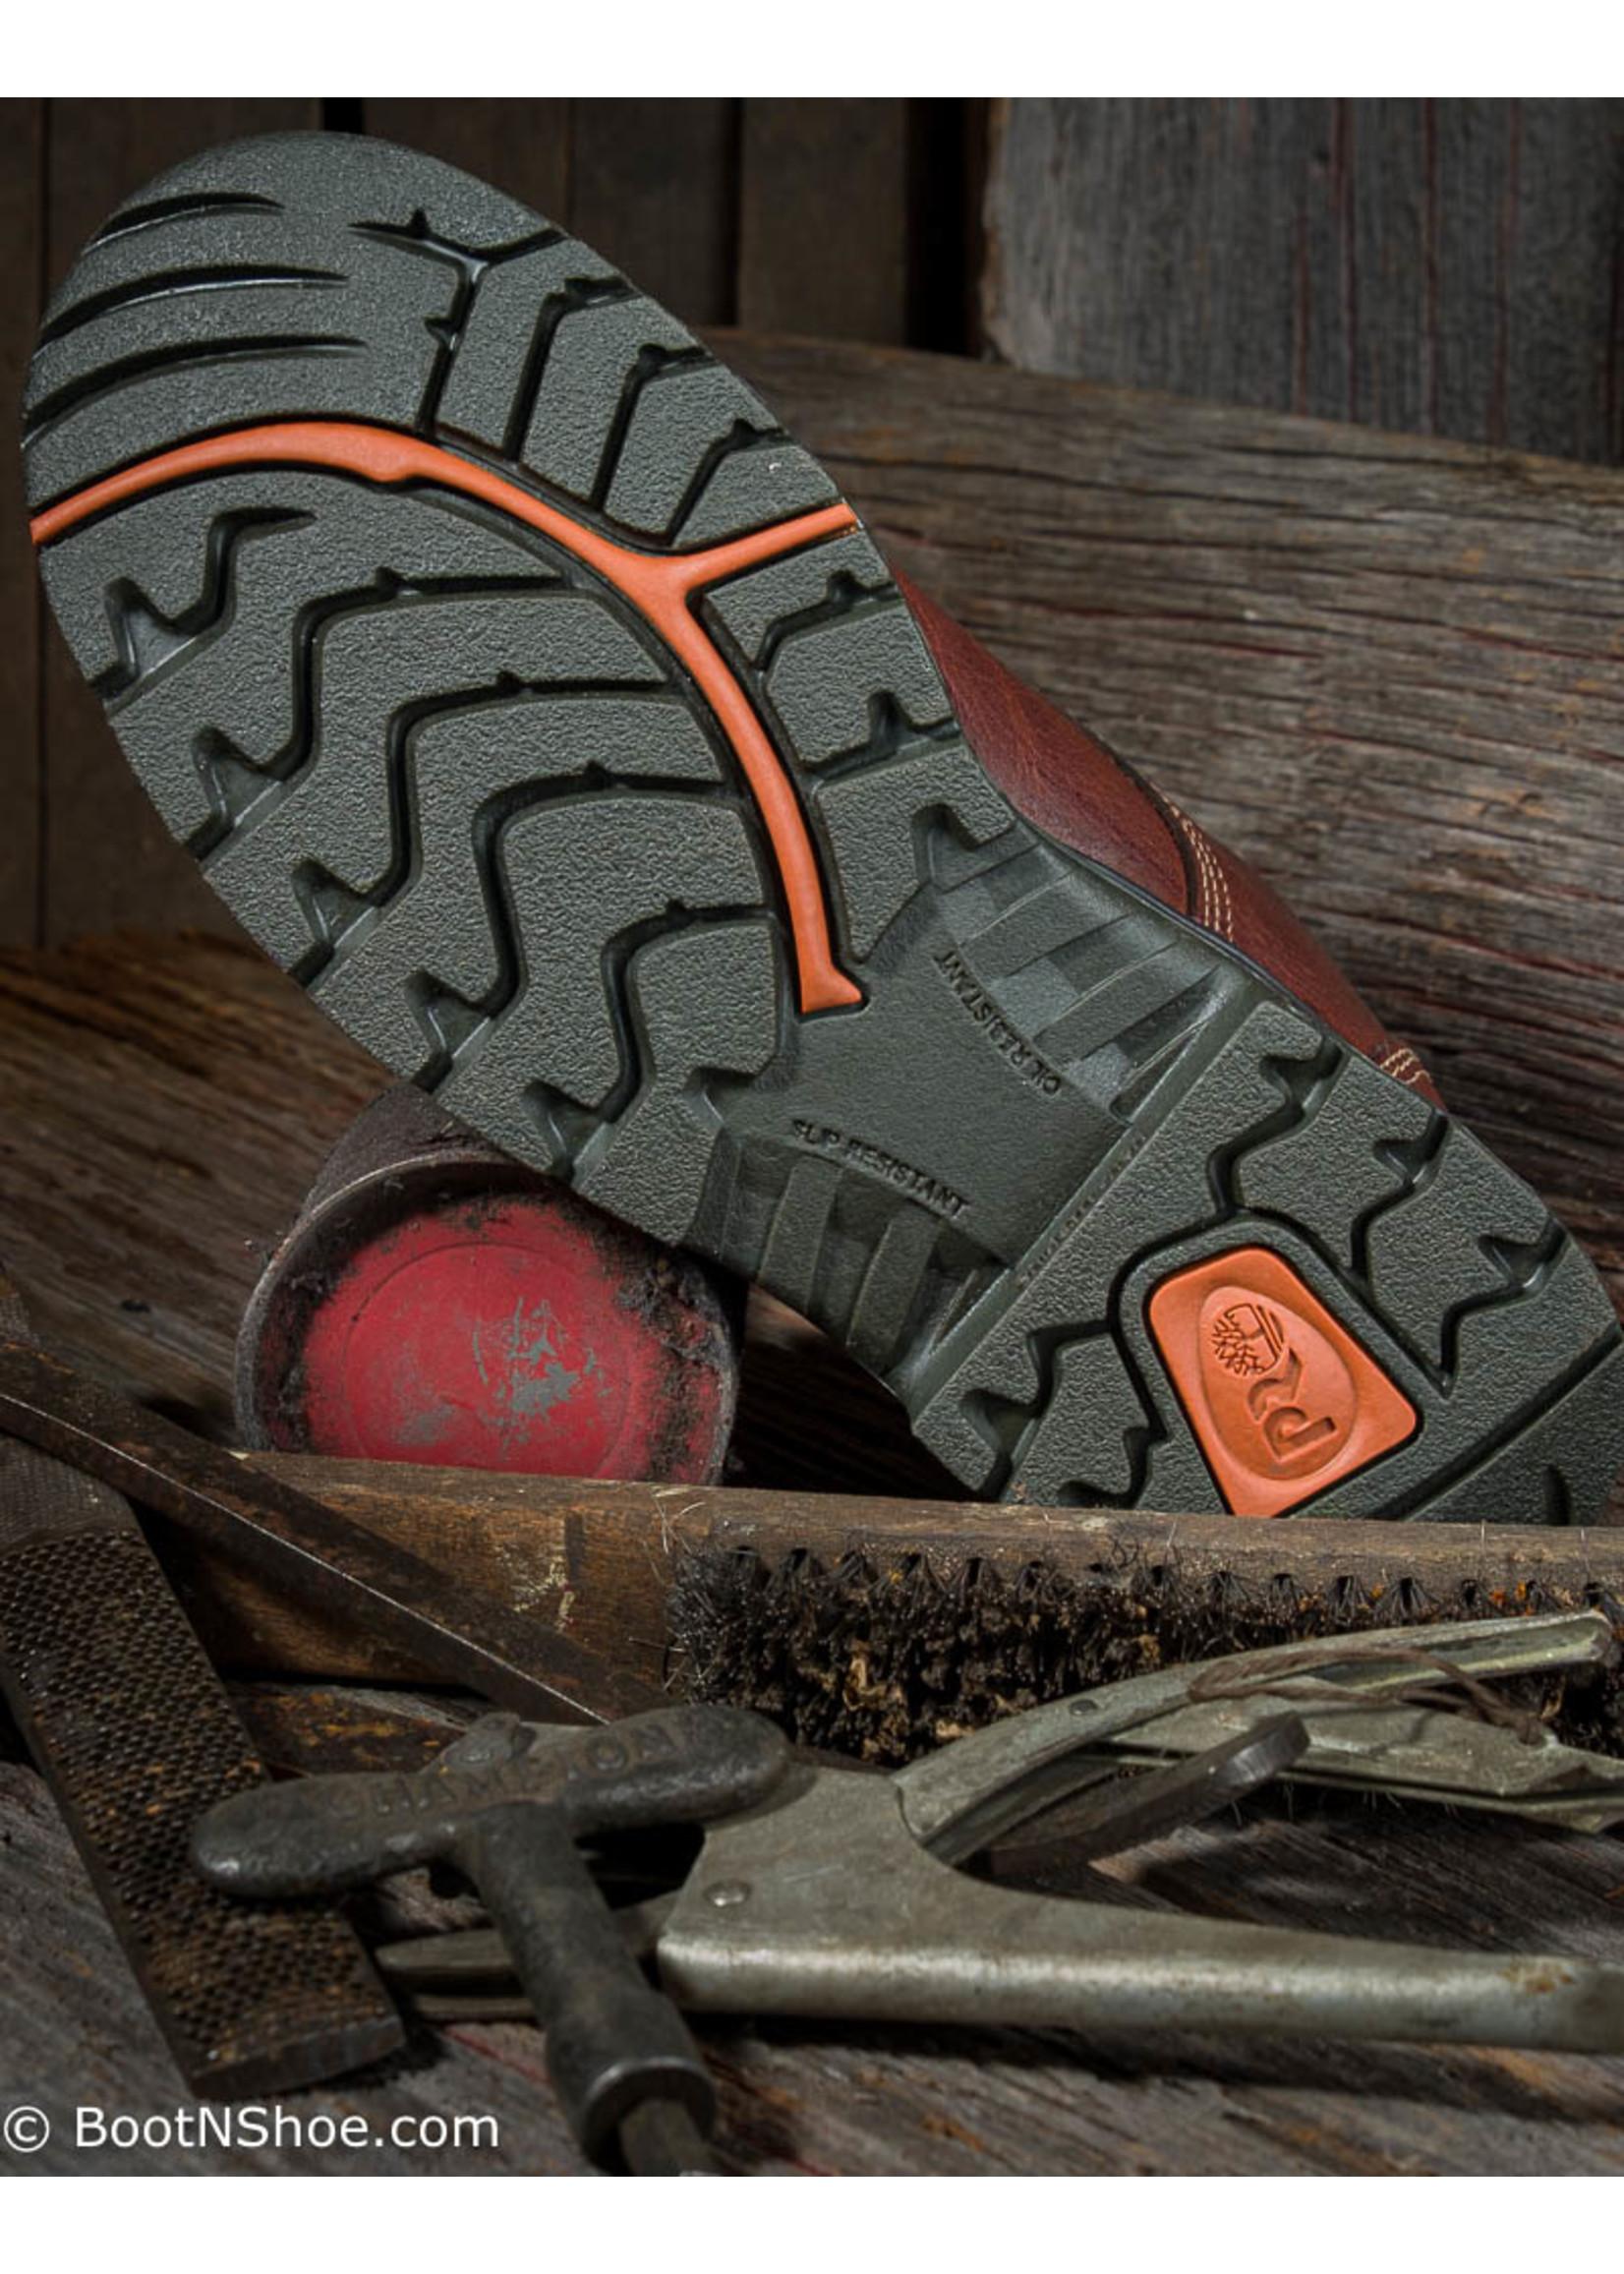 Timberland Pro Men's Titan Alloy Toe Oxford Work Shoes 47028